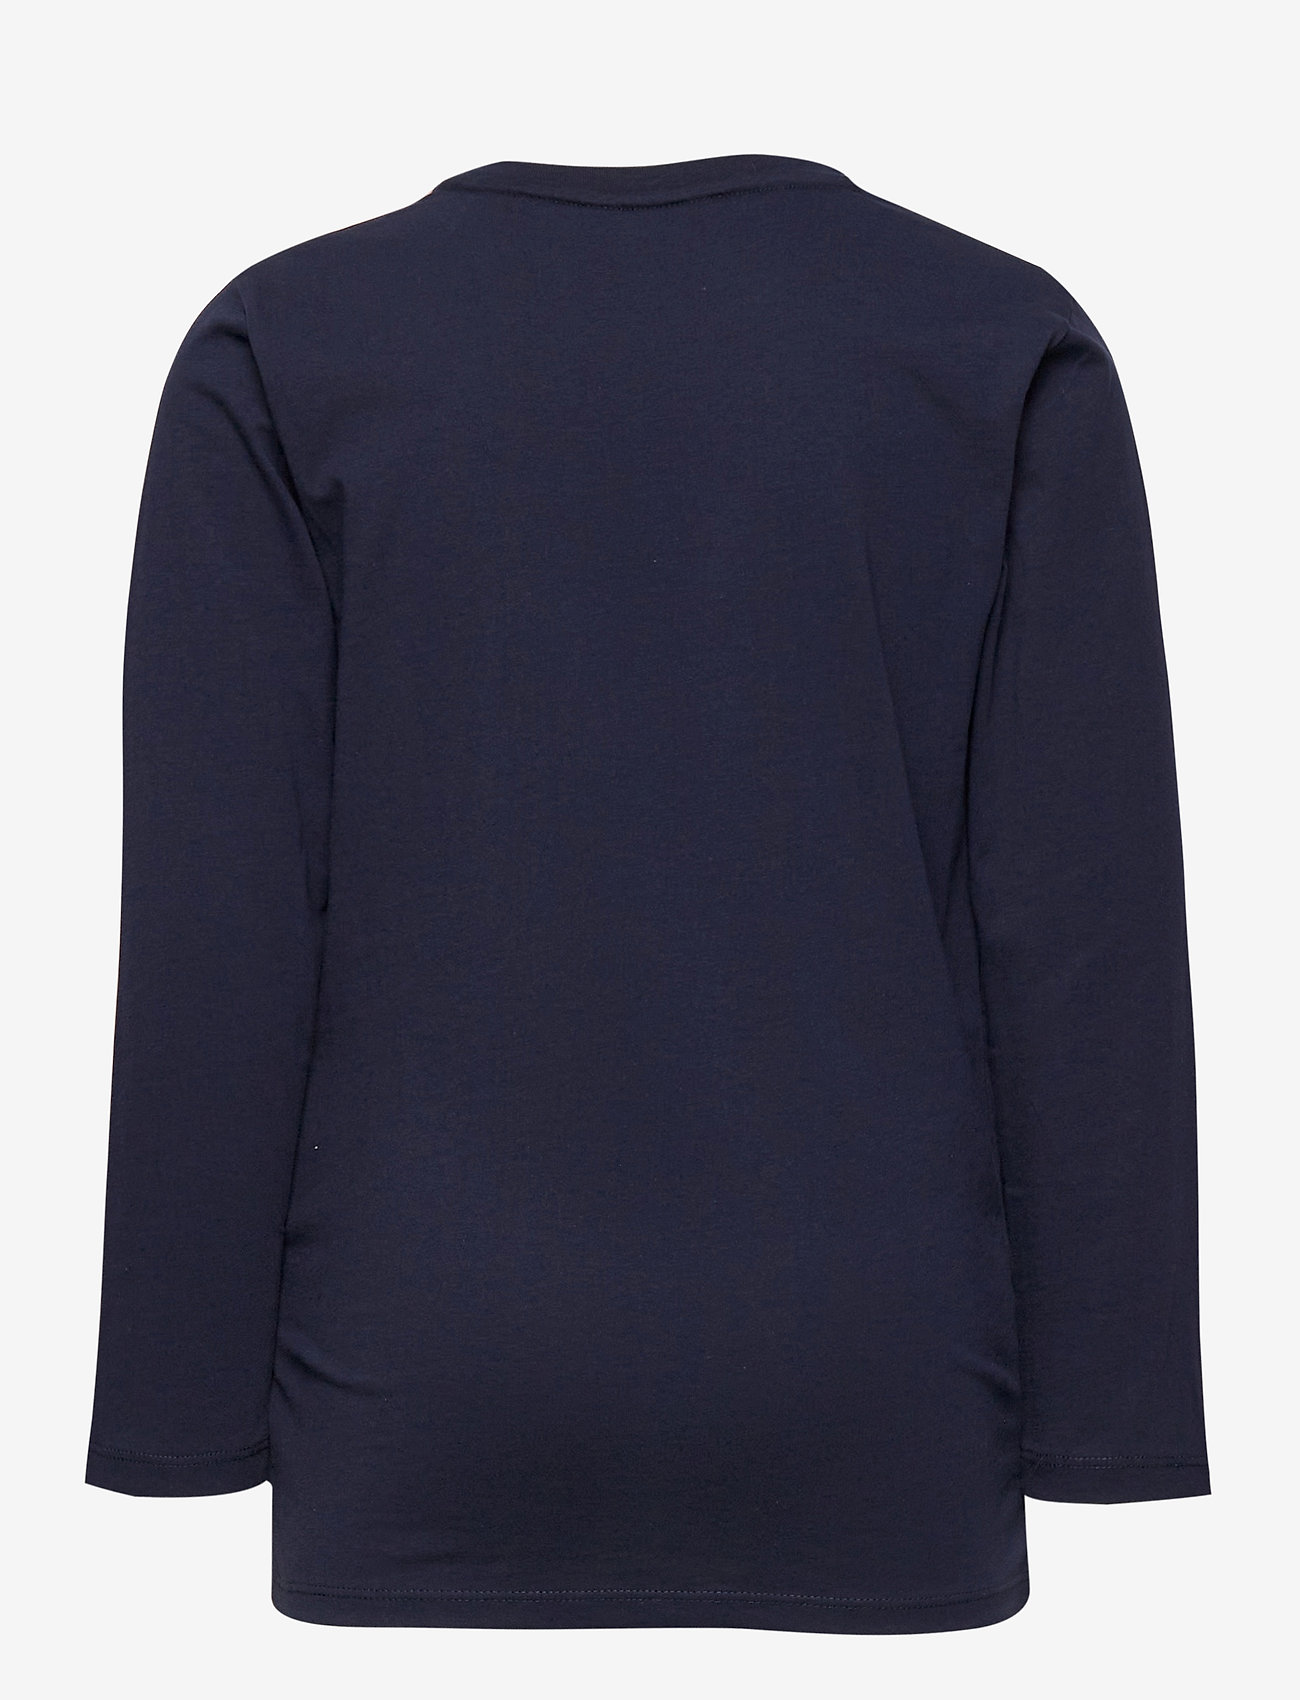 GANT - GANT LOCK-UP LS T-SHIRT - long-sleeved t-shirts - evening blue - 1